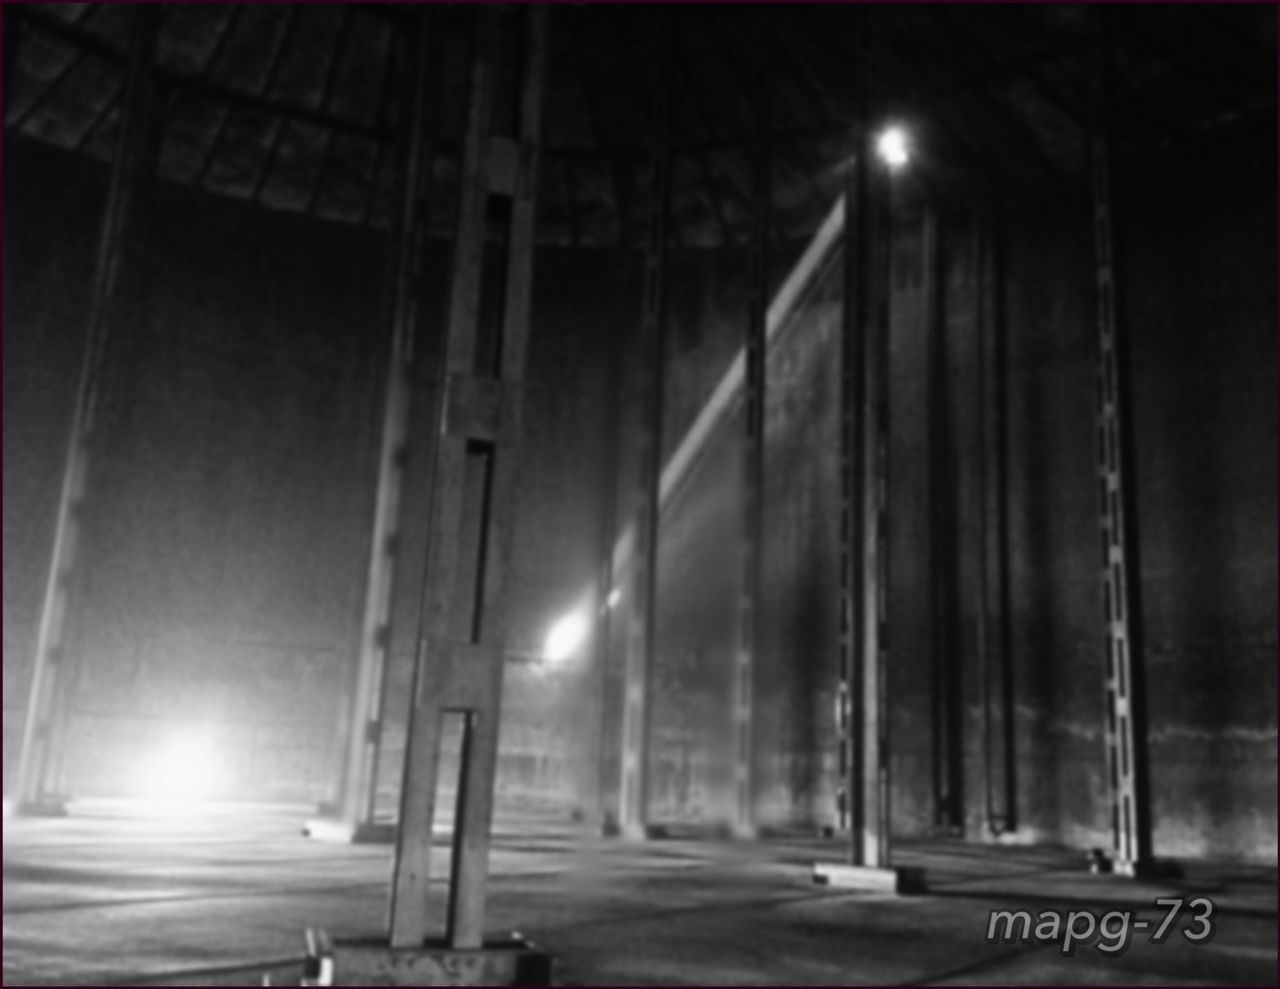 Illuminated Indoors  No People EyeEm Best Shots Blackandwhite Photography Blackandwhite EyeEm Best Shots - Black + White Industry Eyeem Monochrome